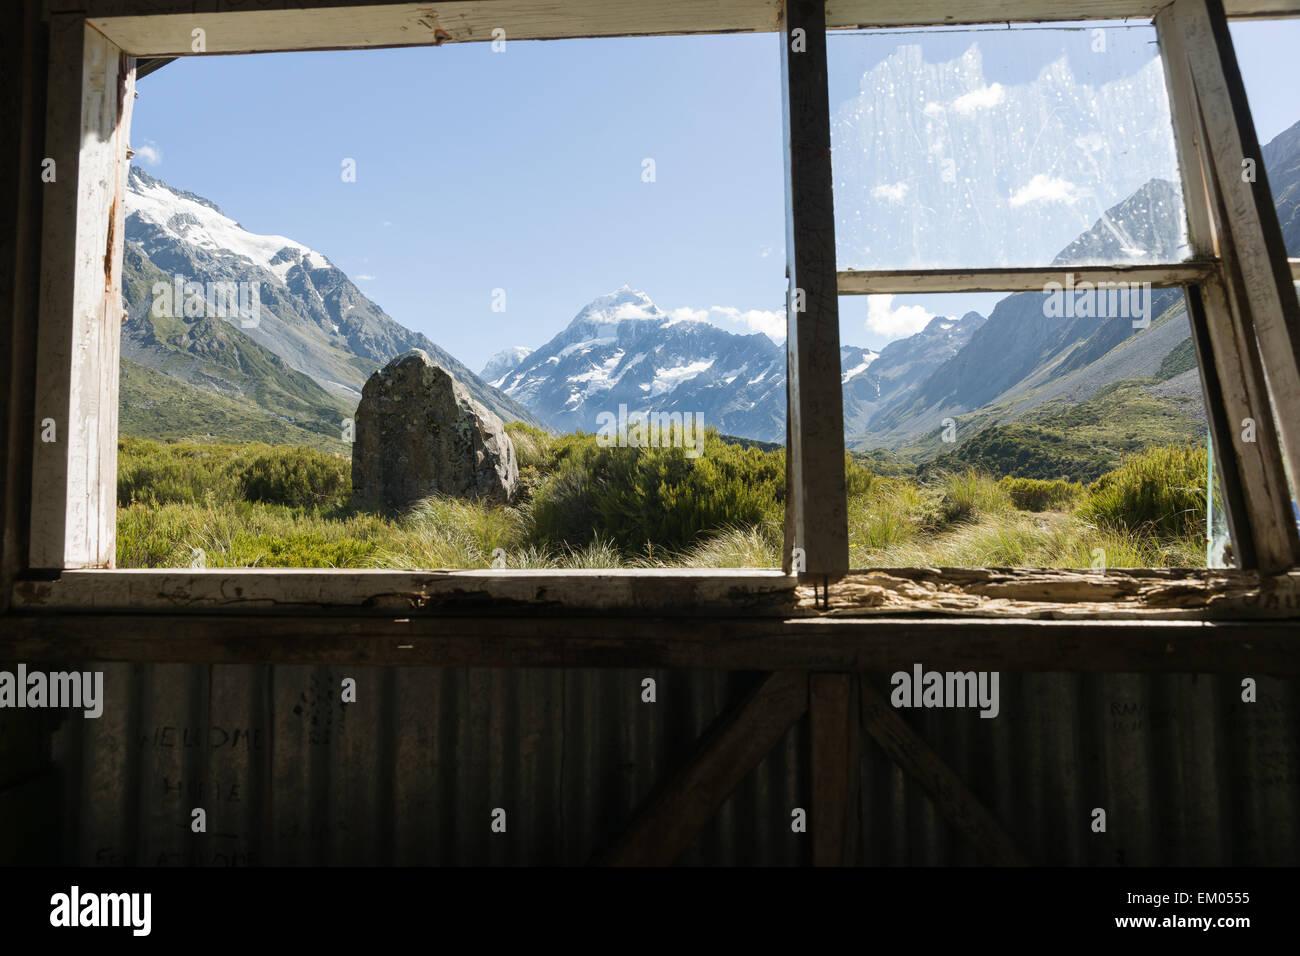 Old dilapidated building interior view stockfotos old for Fenster immer im vordergrund